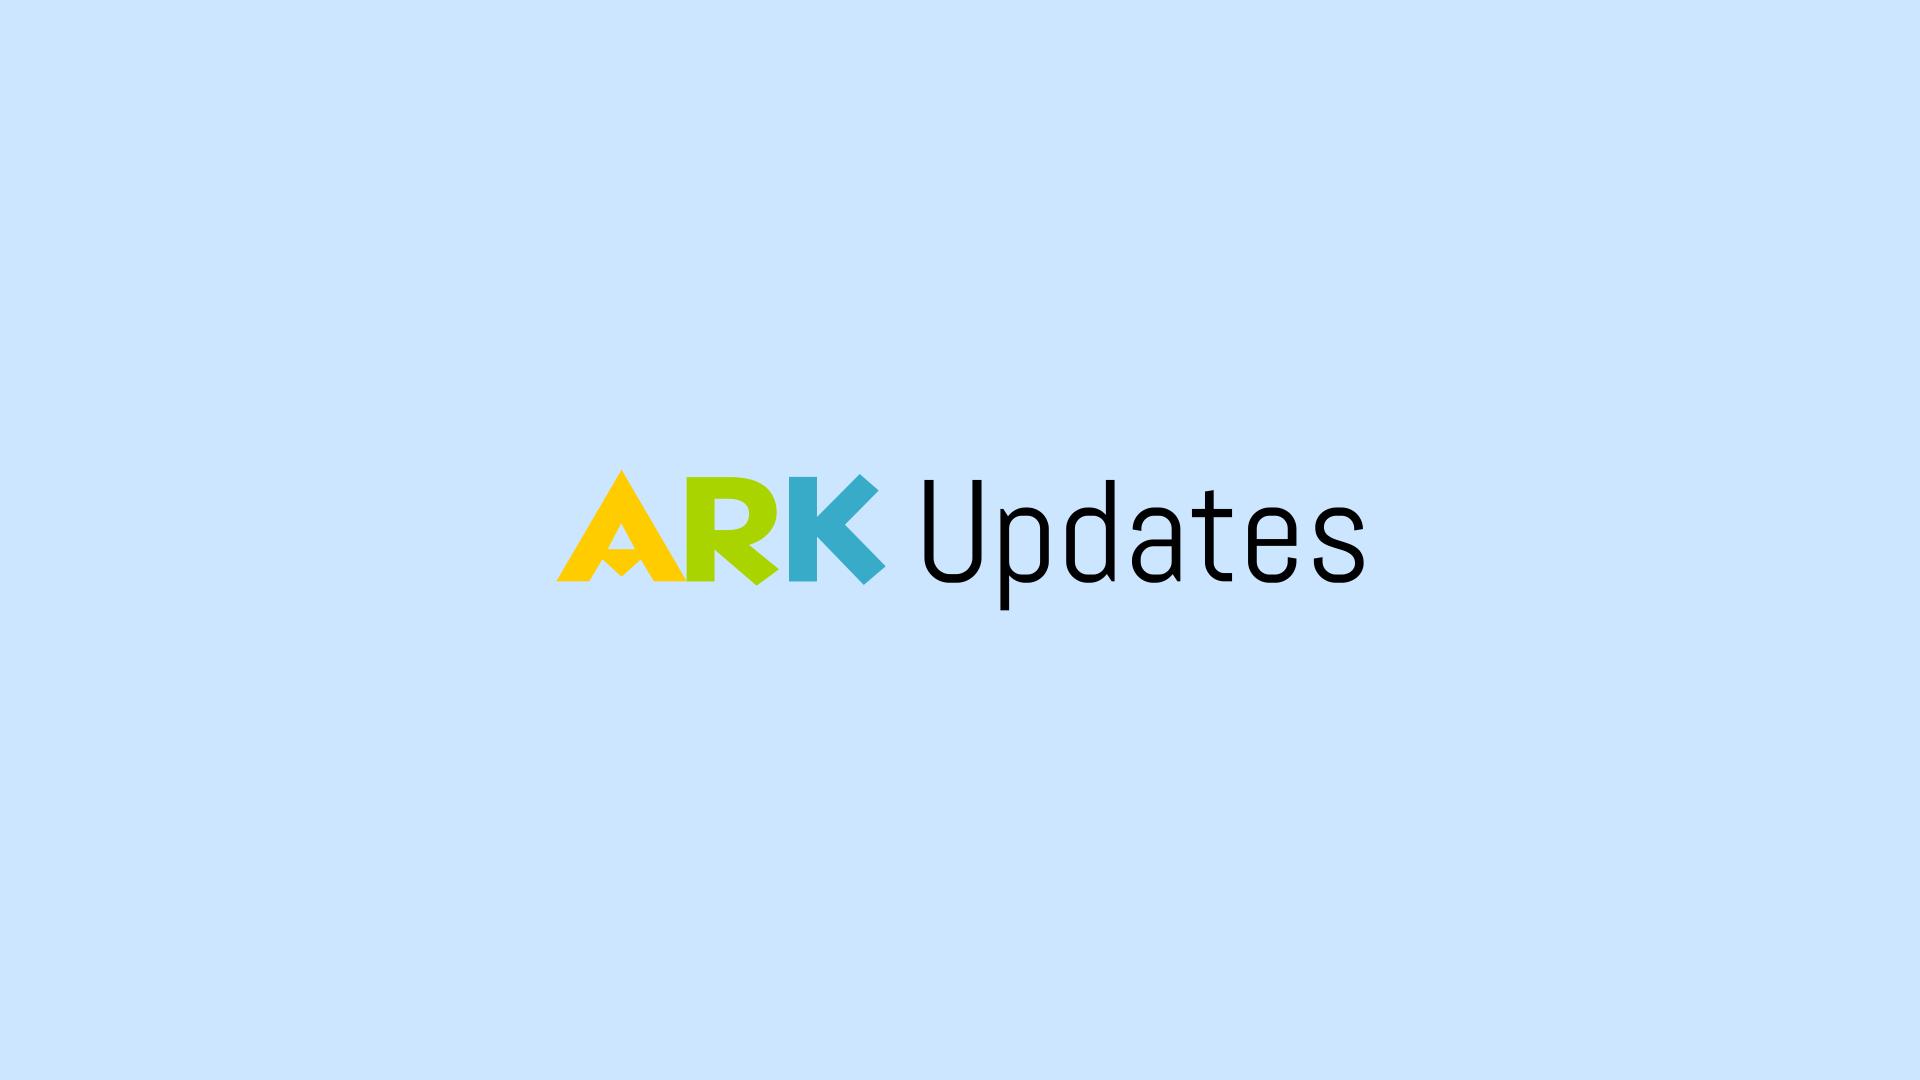 Default ARK Updates Image